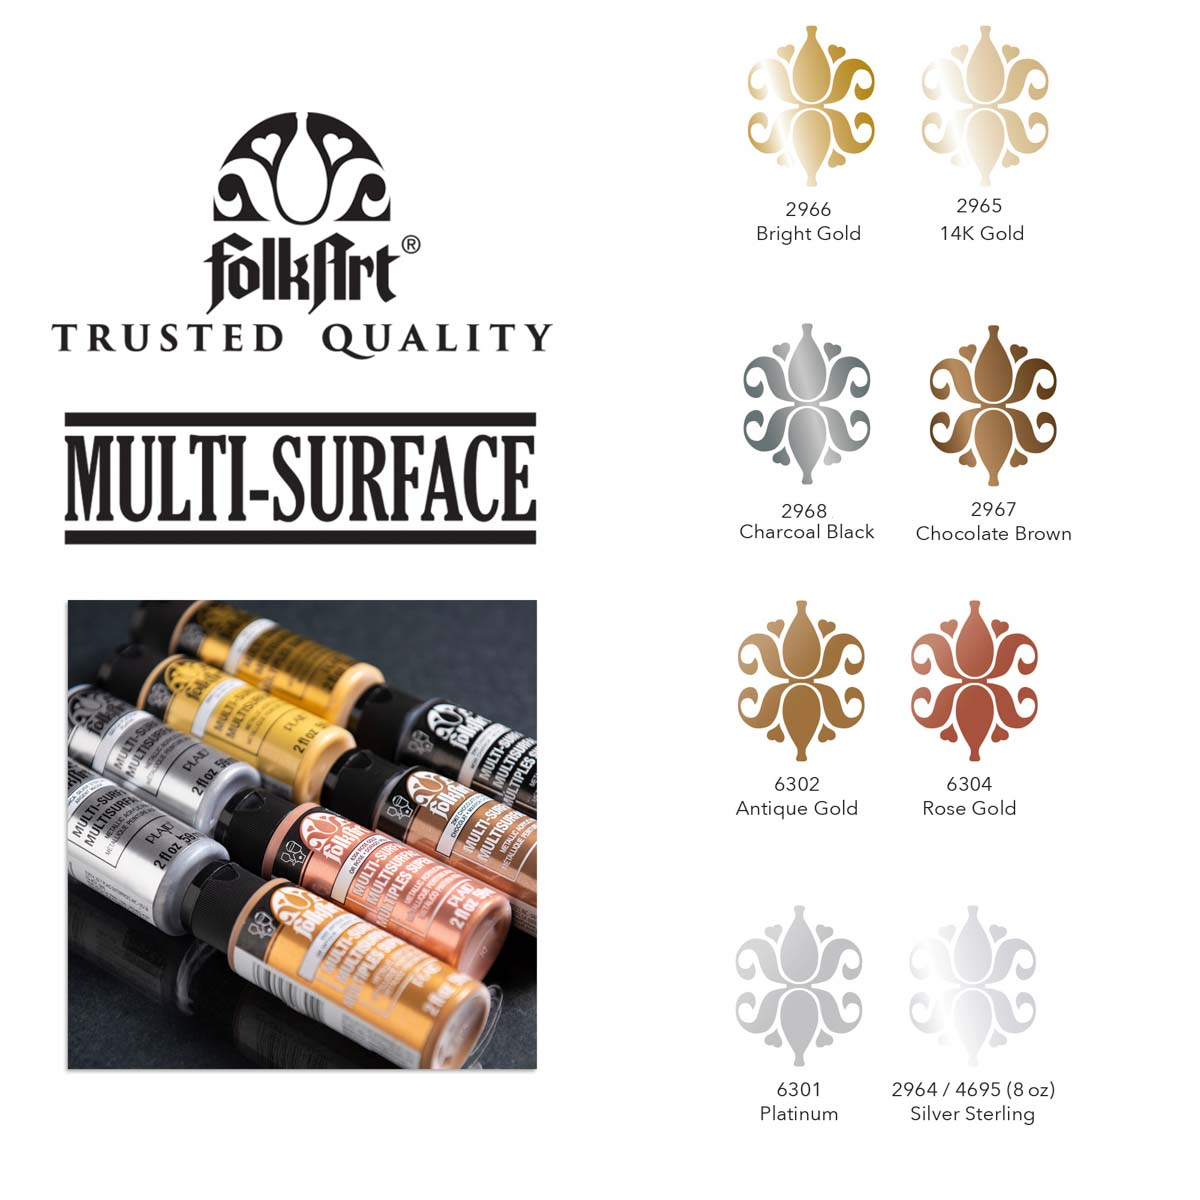 FolkArt ® Multi-Surface Metallic Acrylic Paint 8 Color Set - PROMOFAMET